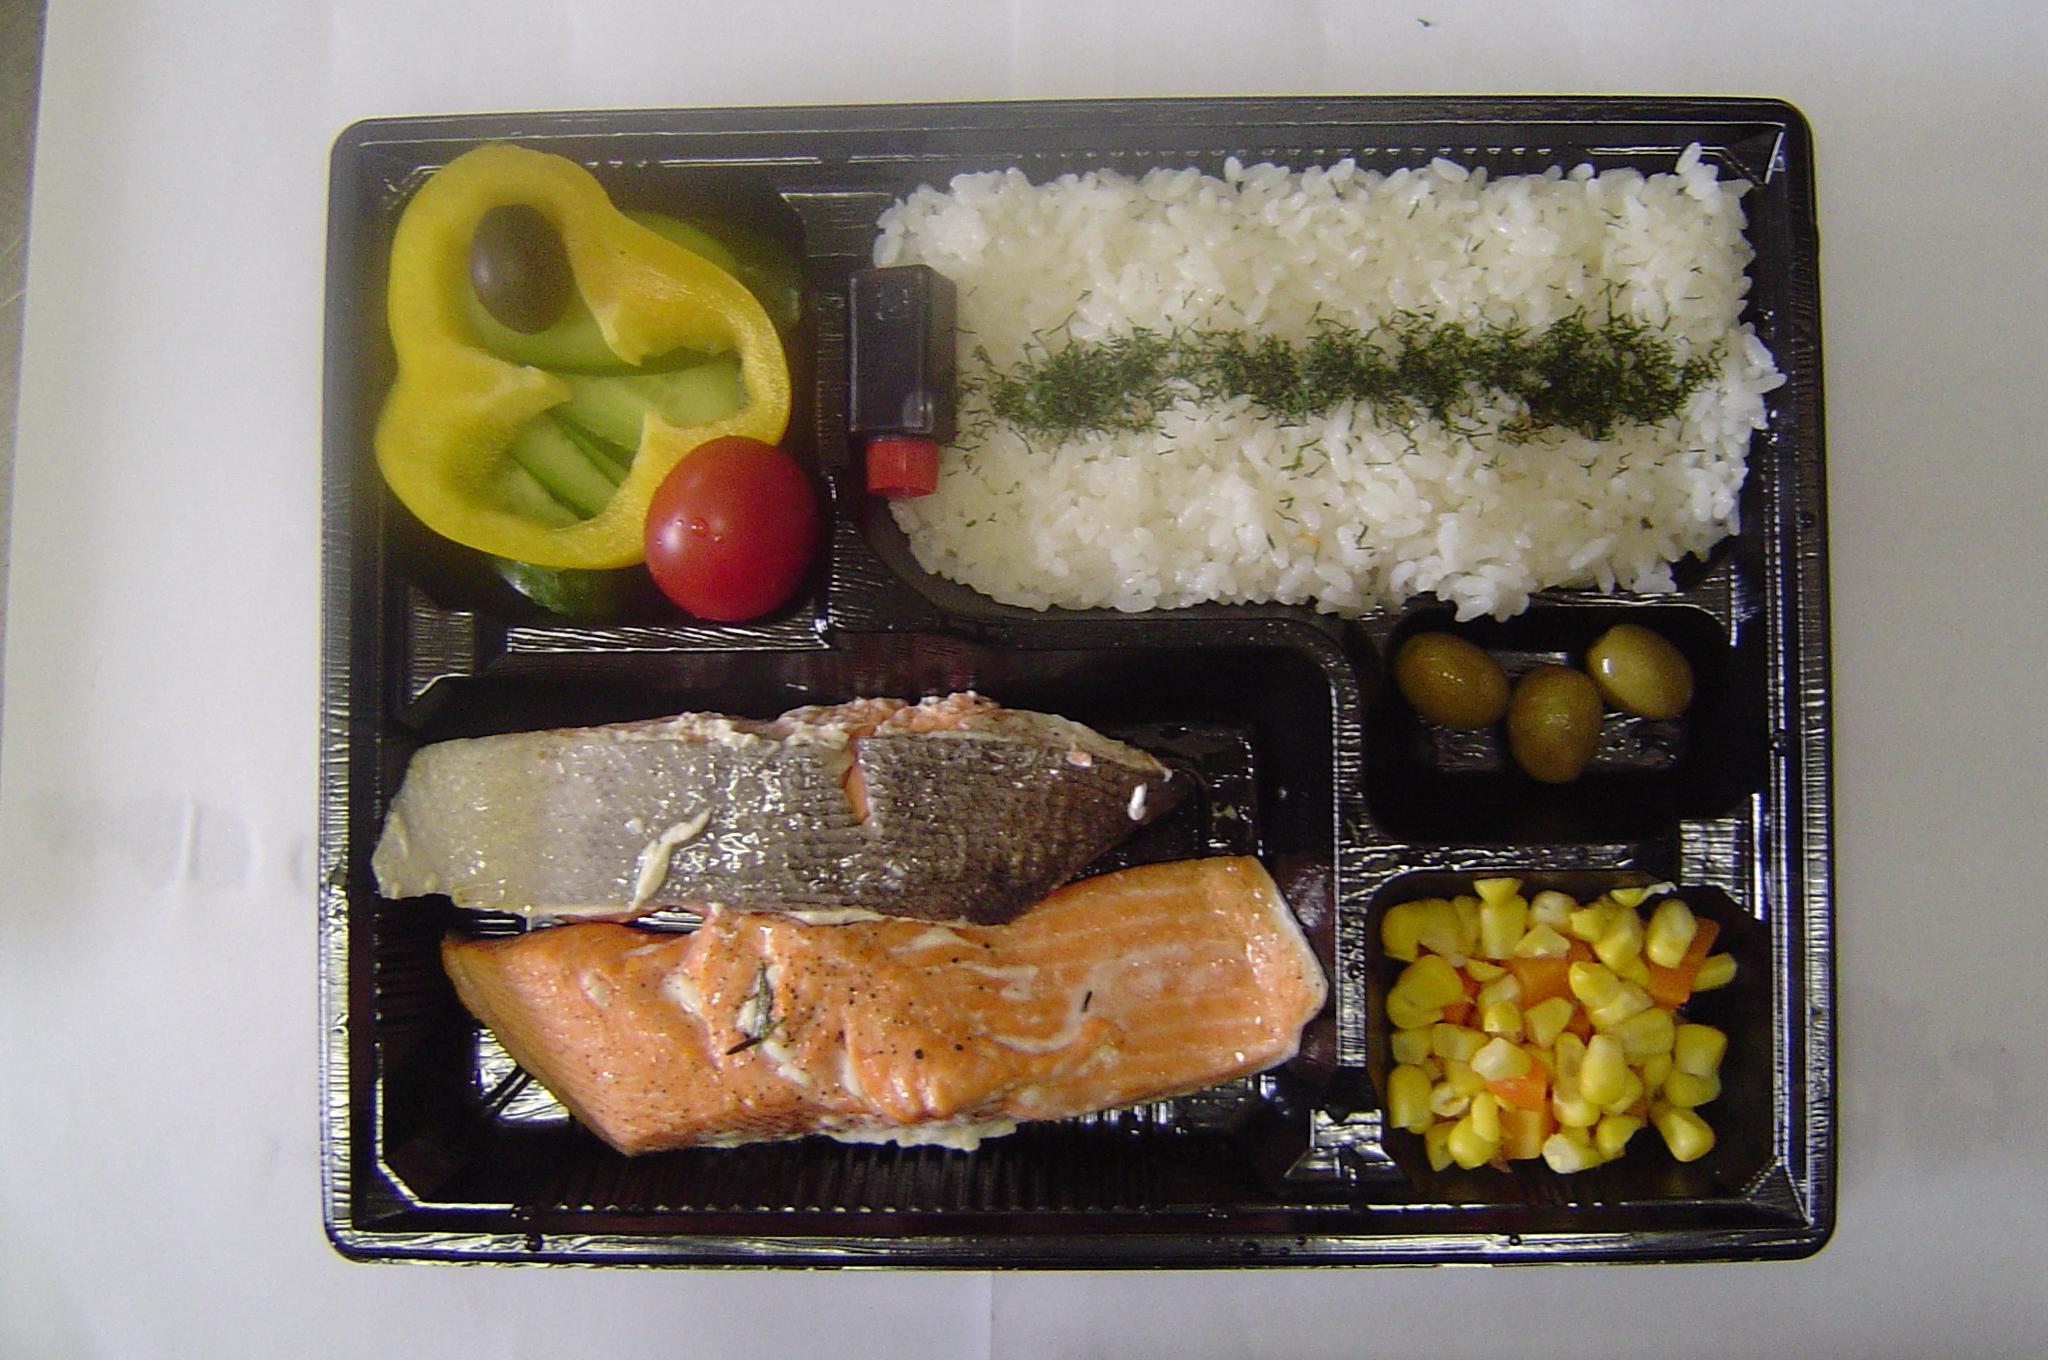 Kosher Fish Lunchbox Tokyo Japan Chabad Tokyo Japan